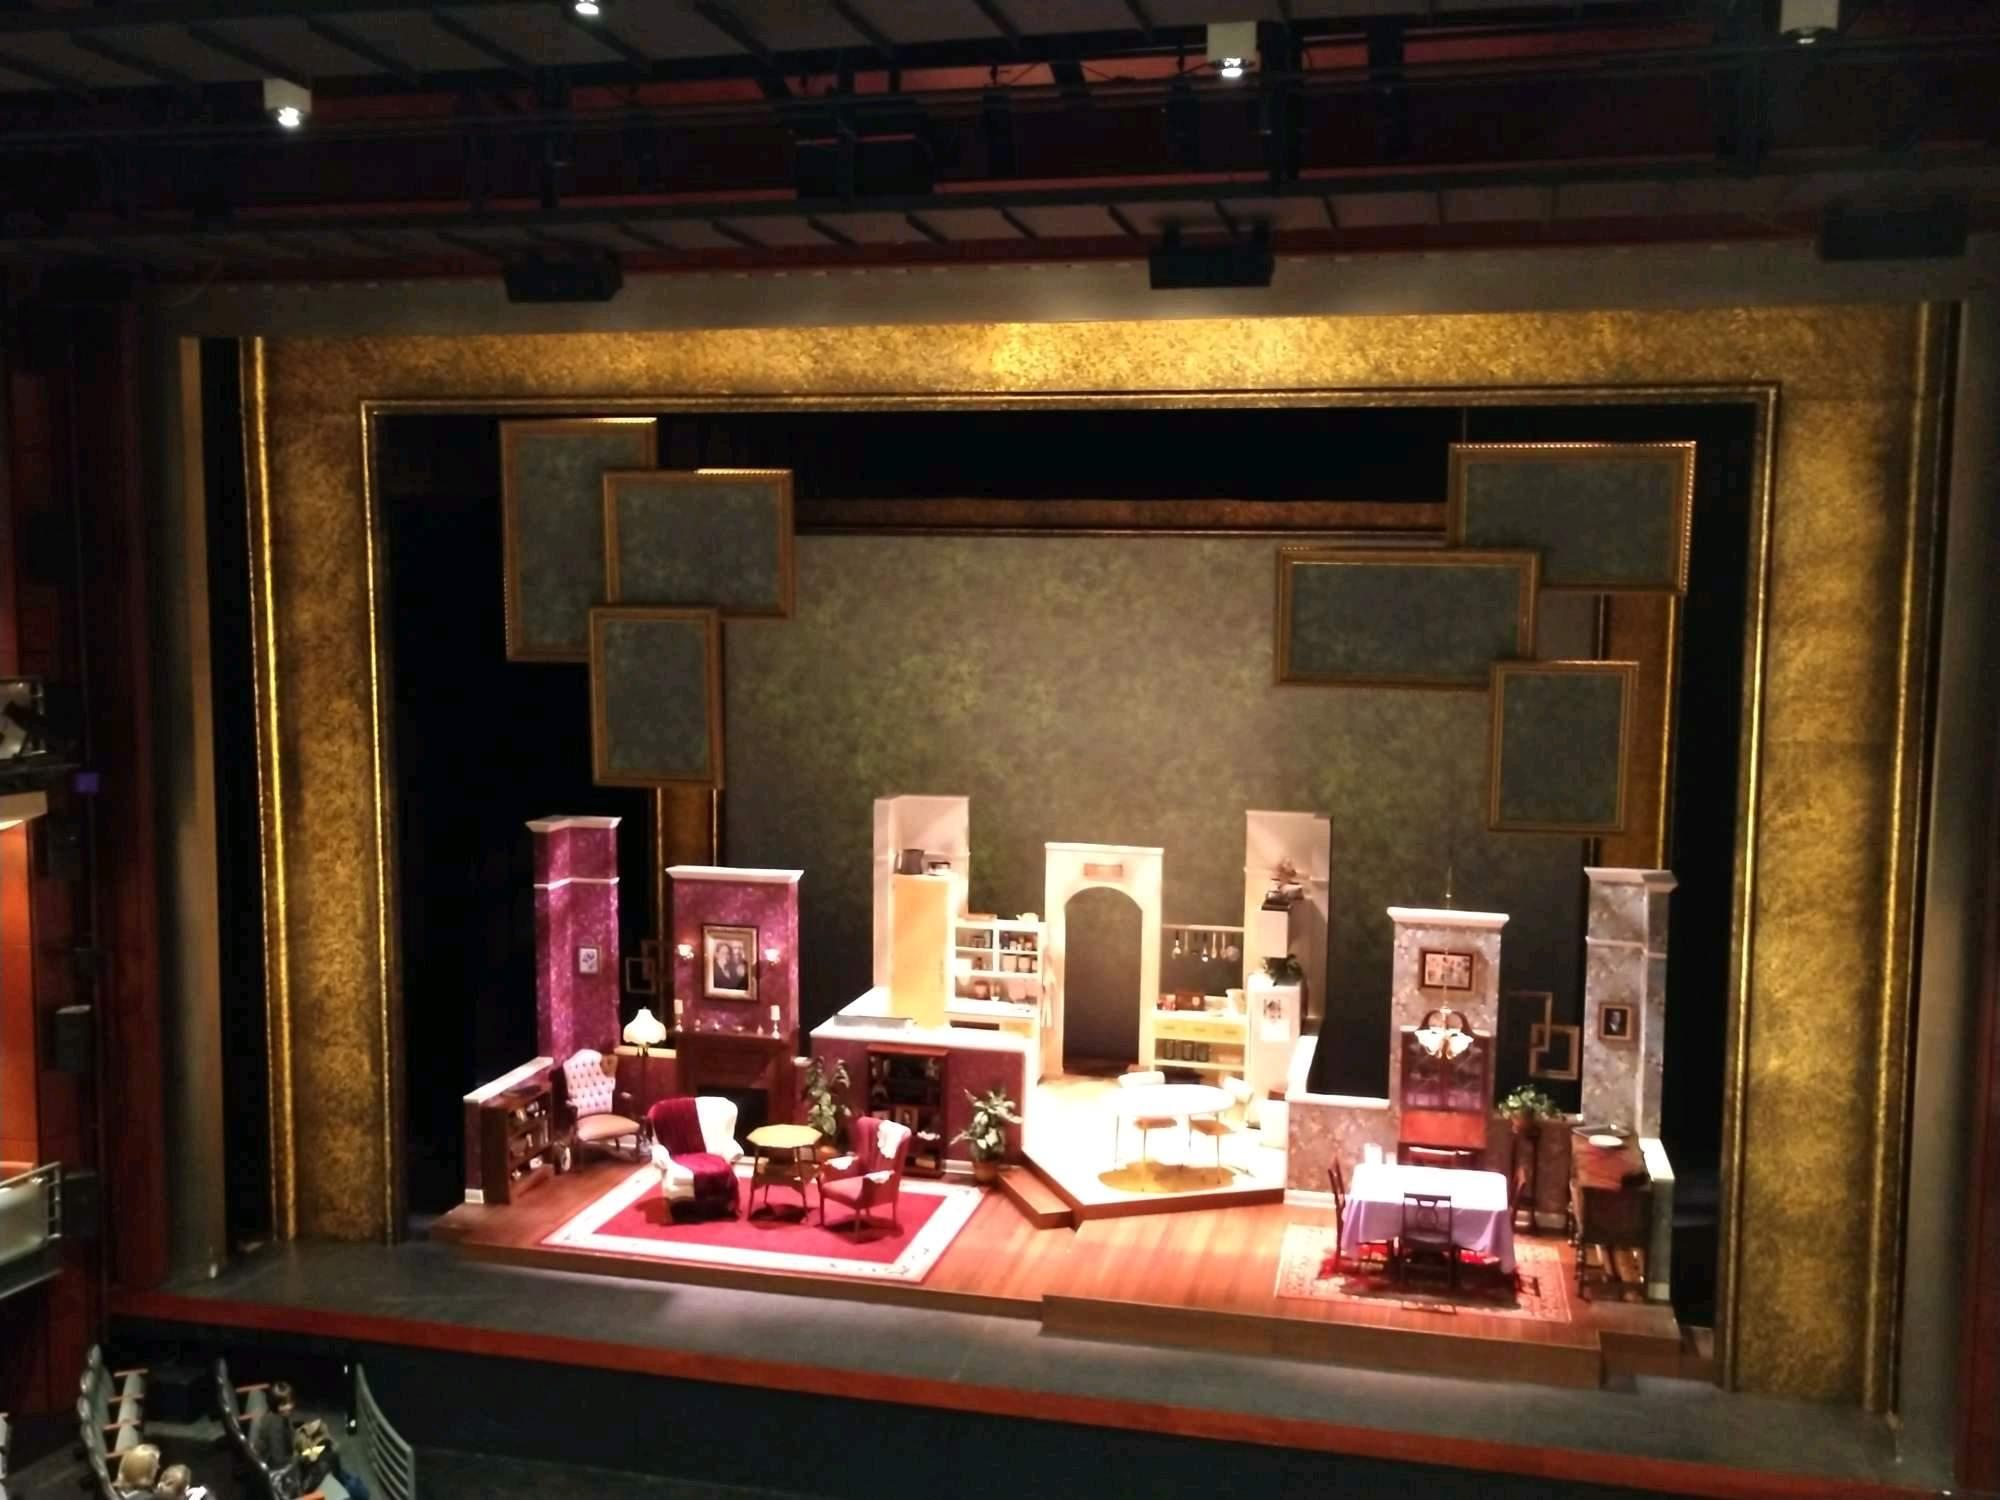 A.J. Fletcher Opera Theater Section E Row C Seat 207